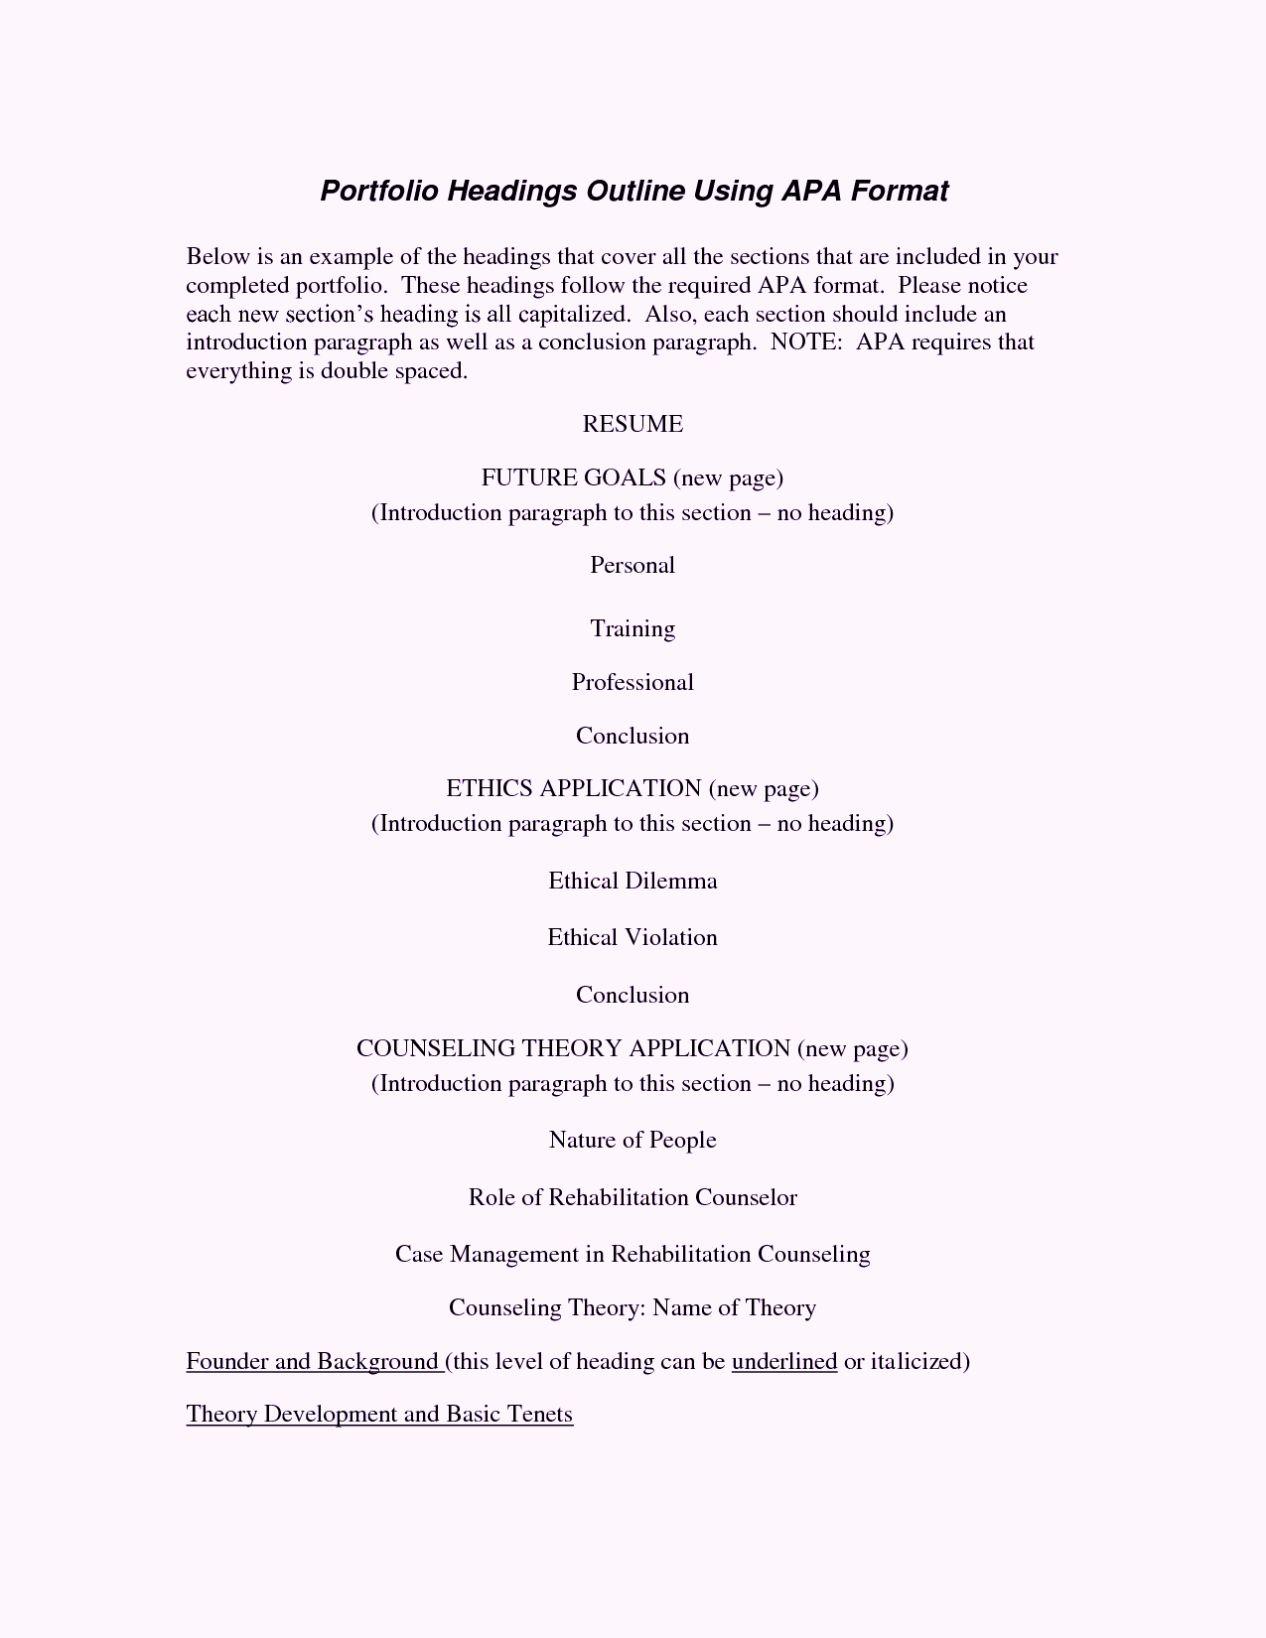 Apa Outline Format Template Lovely Apa Essay Format Template Word 6th Edition Word Outline Format Apa Format Template Apa Essay Format